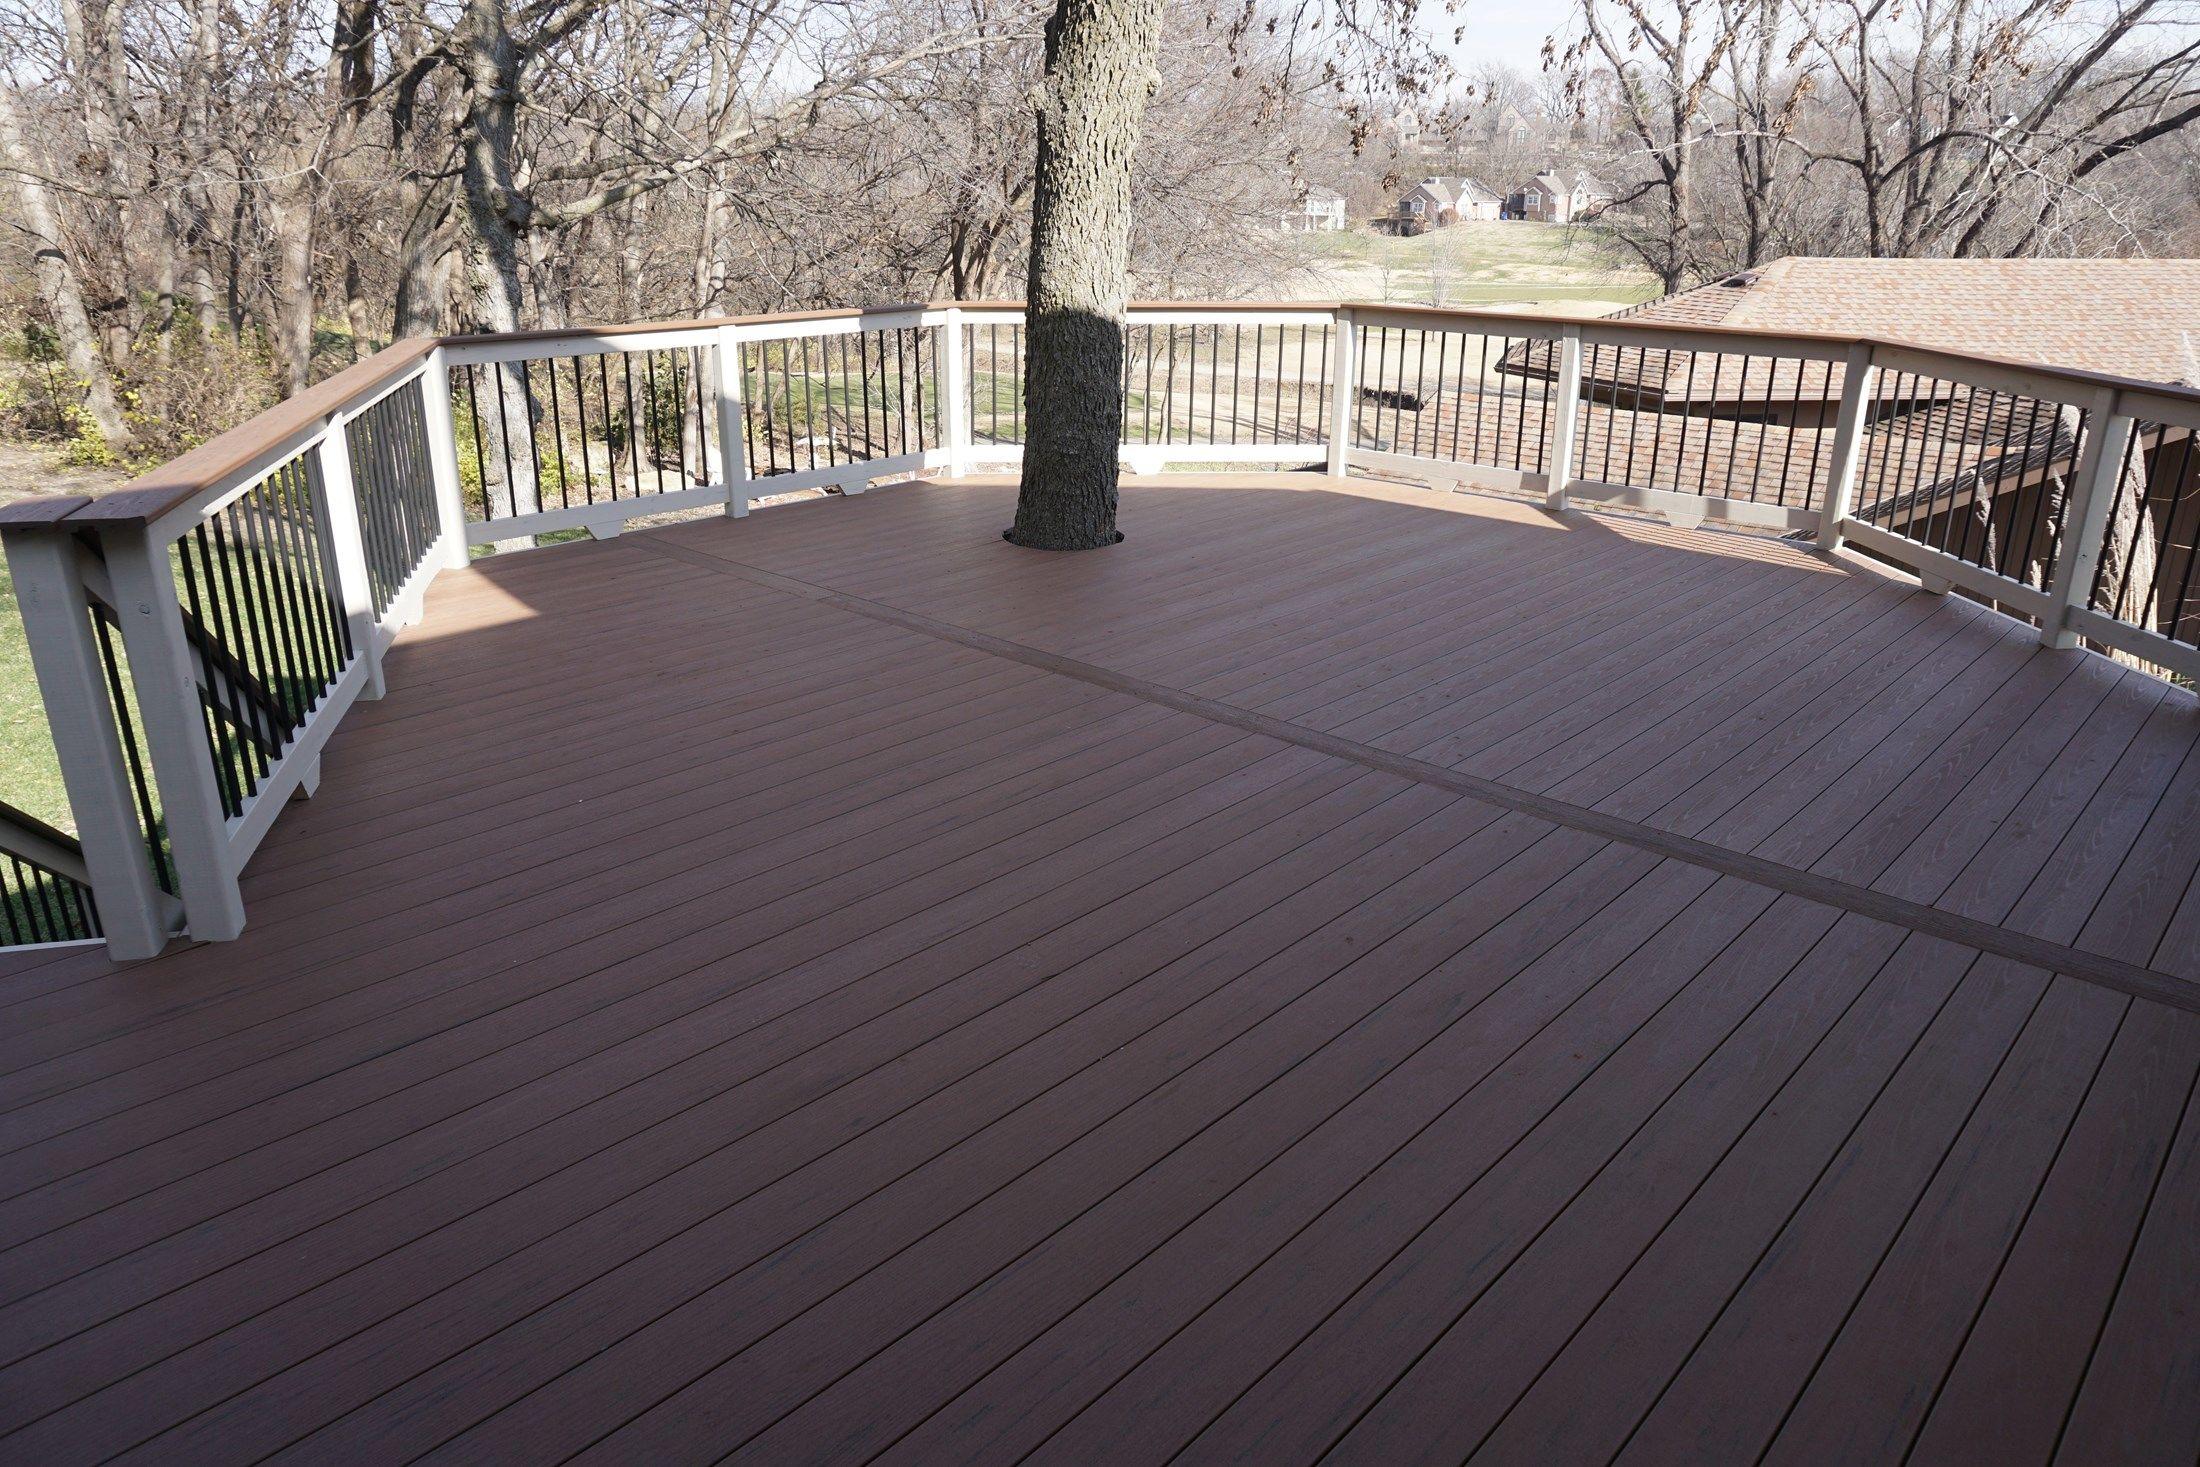 Composite Deck - Picture 5229